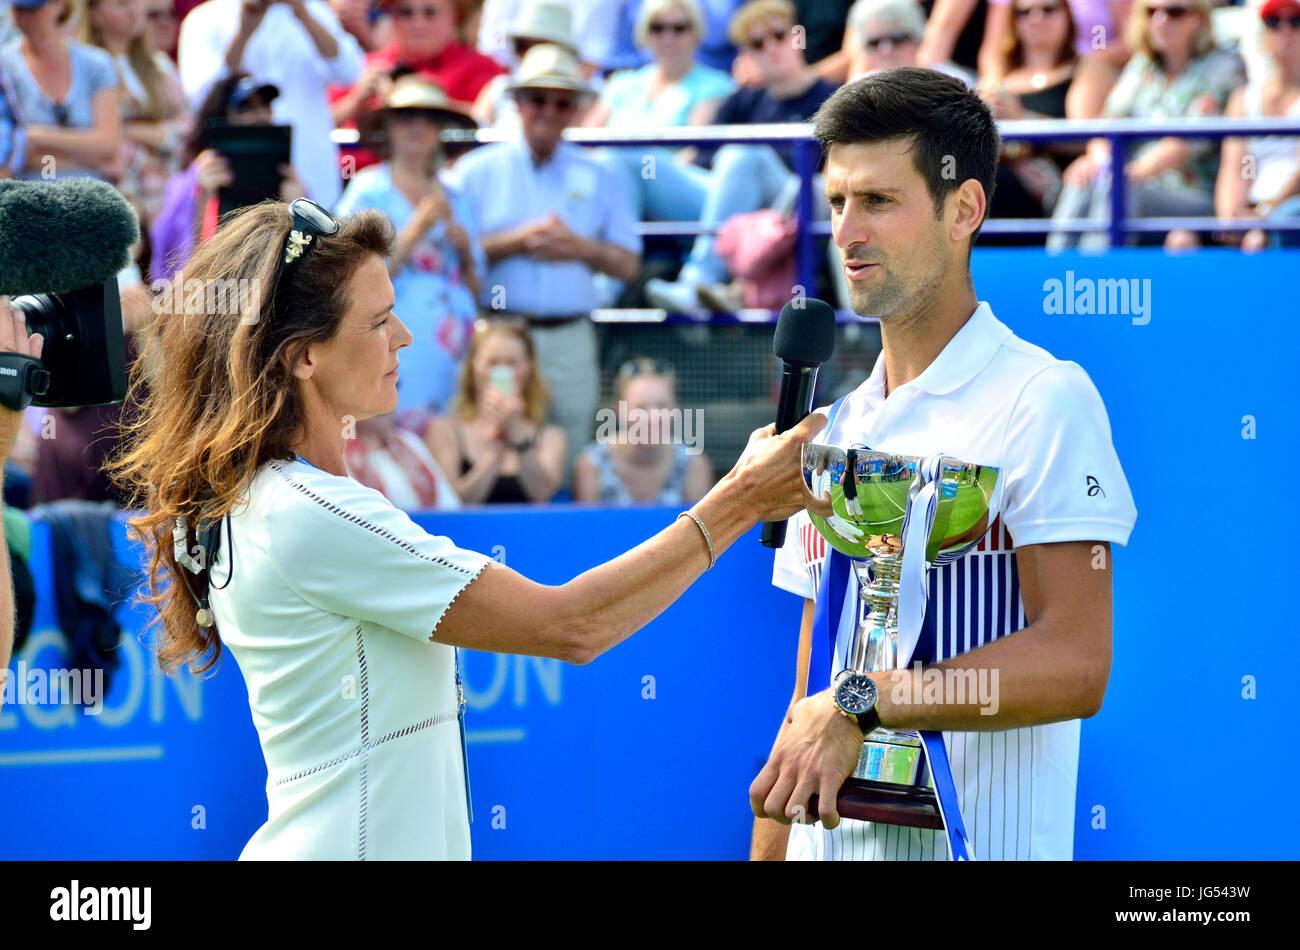 Novak Djokovic (Serbia) interviewed for Eurosport TV by Annabel Croft after winning the final of the Aegon International - Stock Image